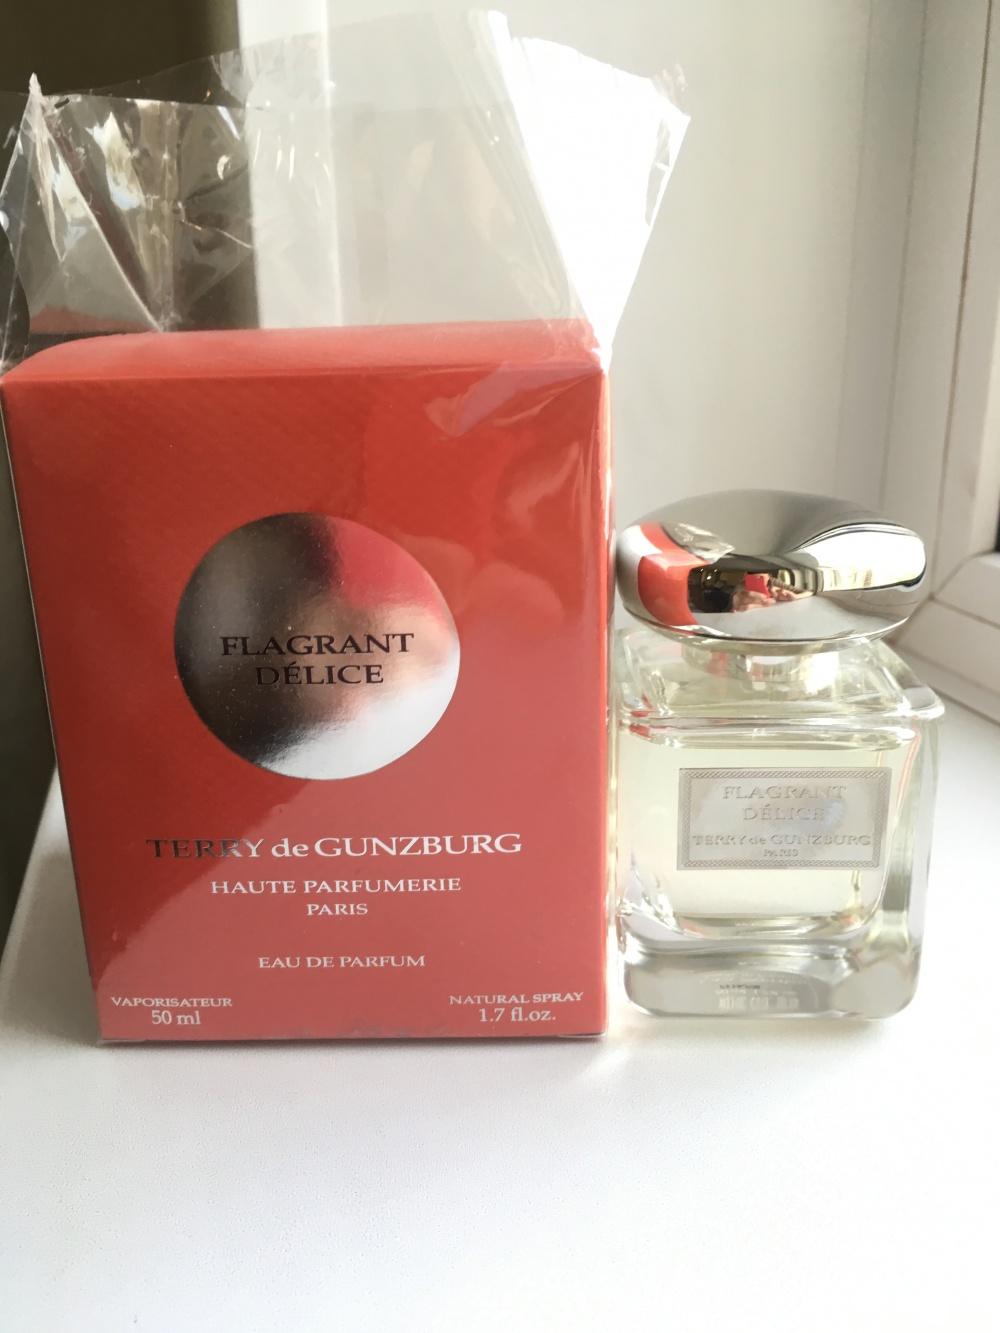 Парфюмерная вода, Flagrant Delice Terry de Gunzburg для женщин, 45/50  мл